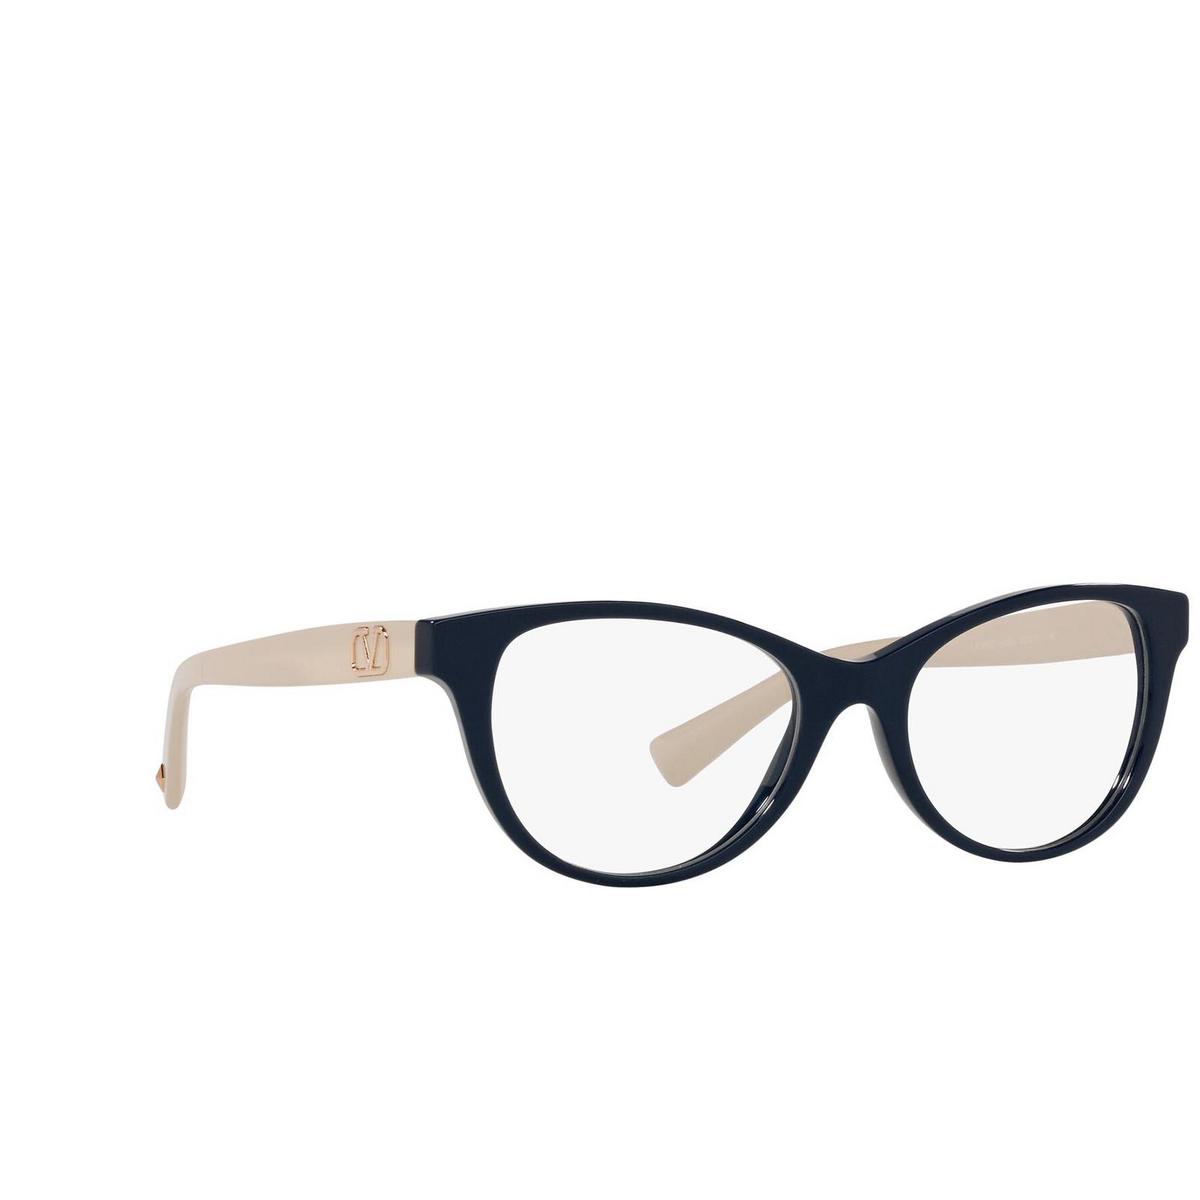 Valentino® Oval Eyeglasses: VA3057 color Blue 5034 - three-quarters view.